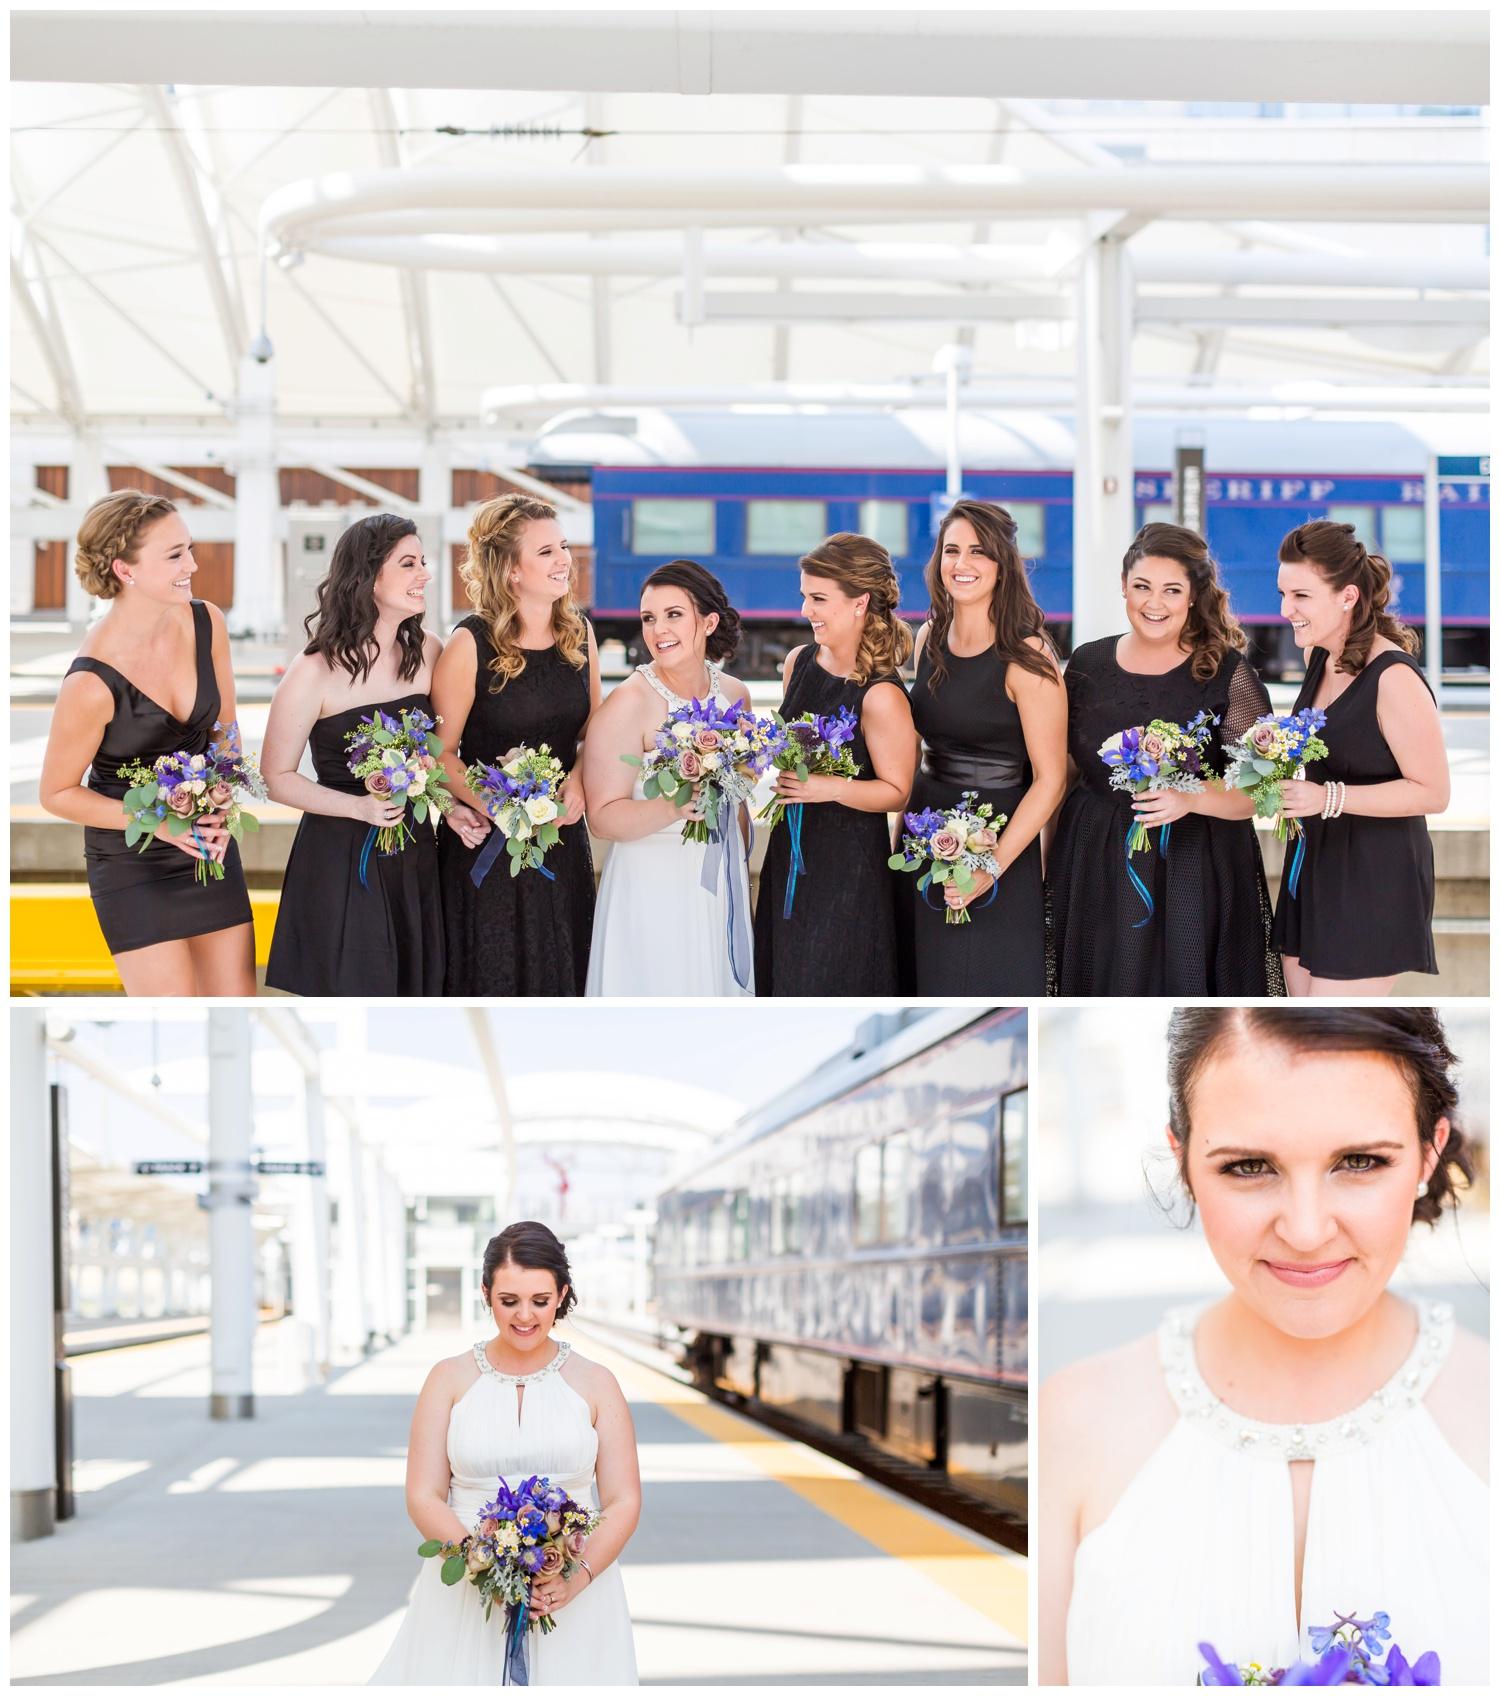 studios at overland crossing wedding photography33.jpg